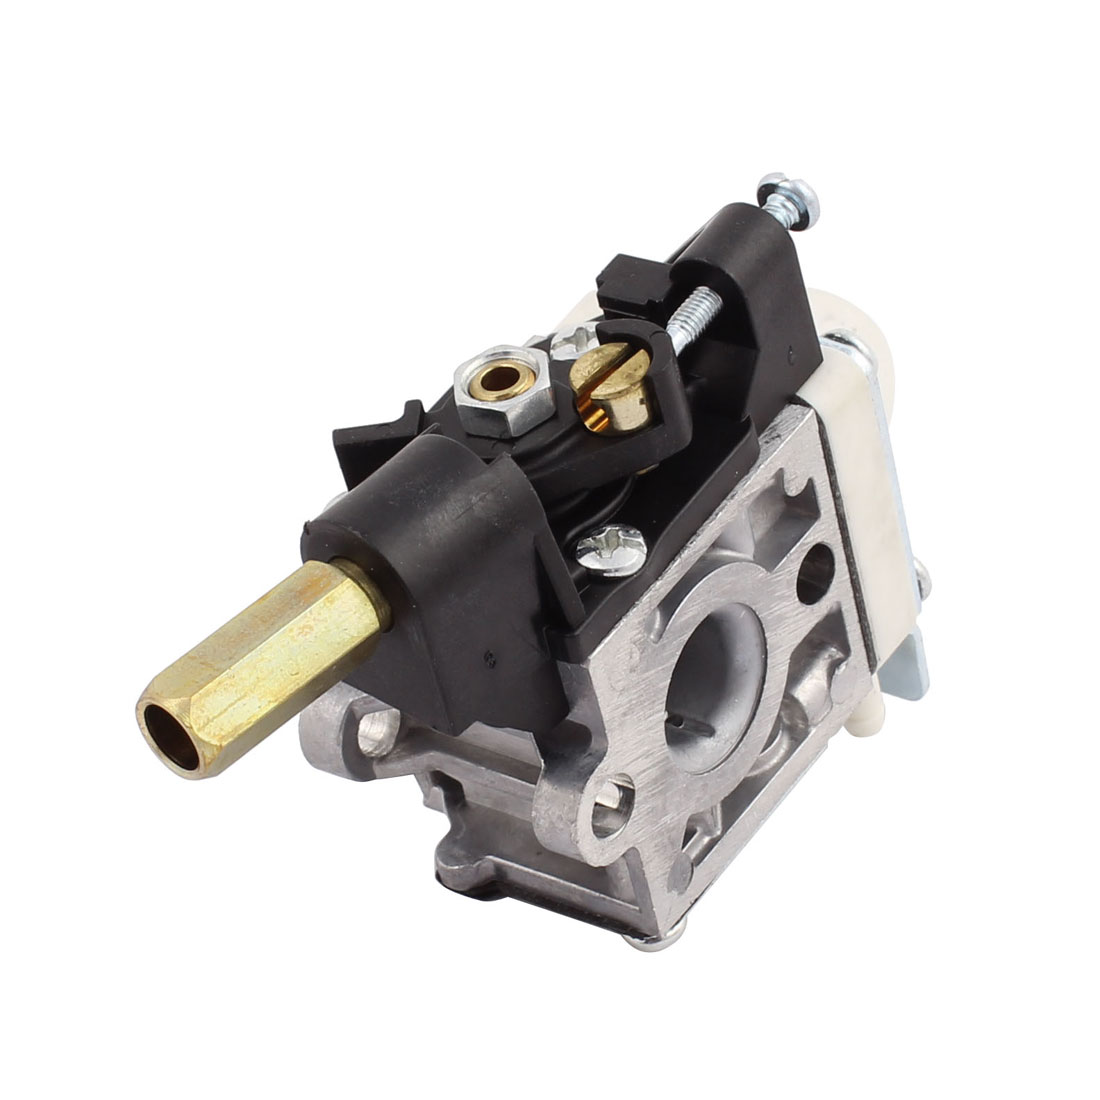 New Carburetor for ZAMA Chainsaw Parts Lawn Mower K84 Carburador Carb